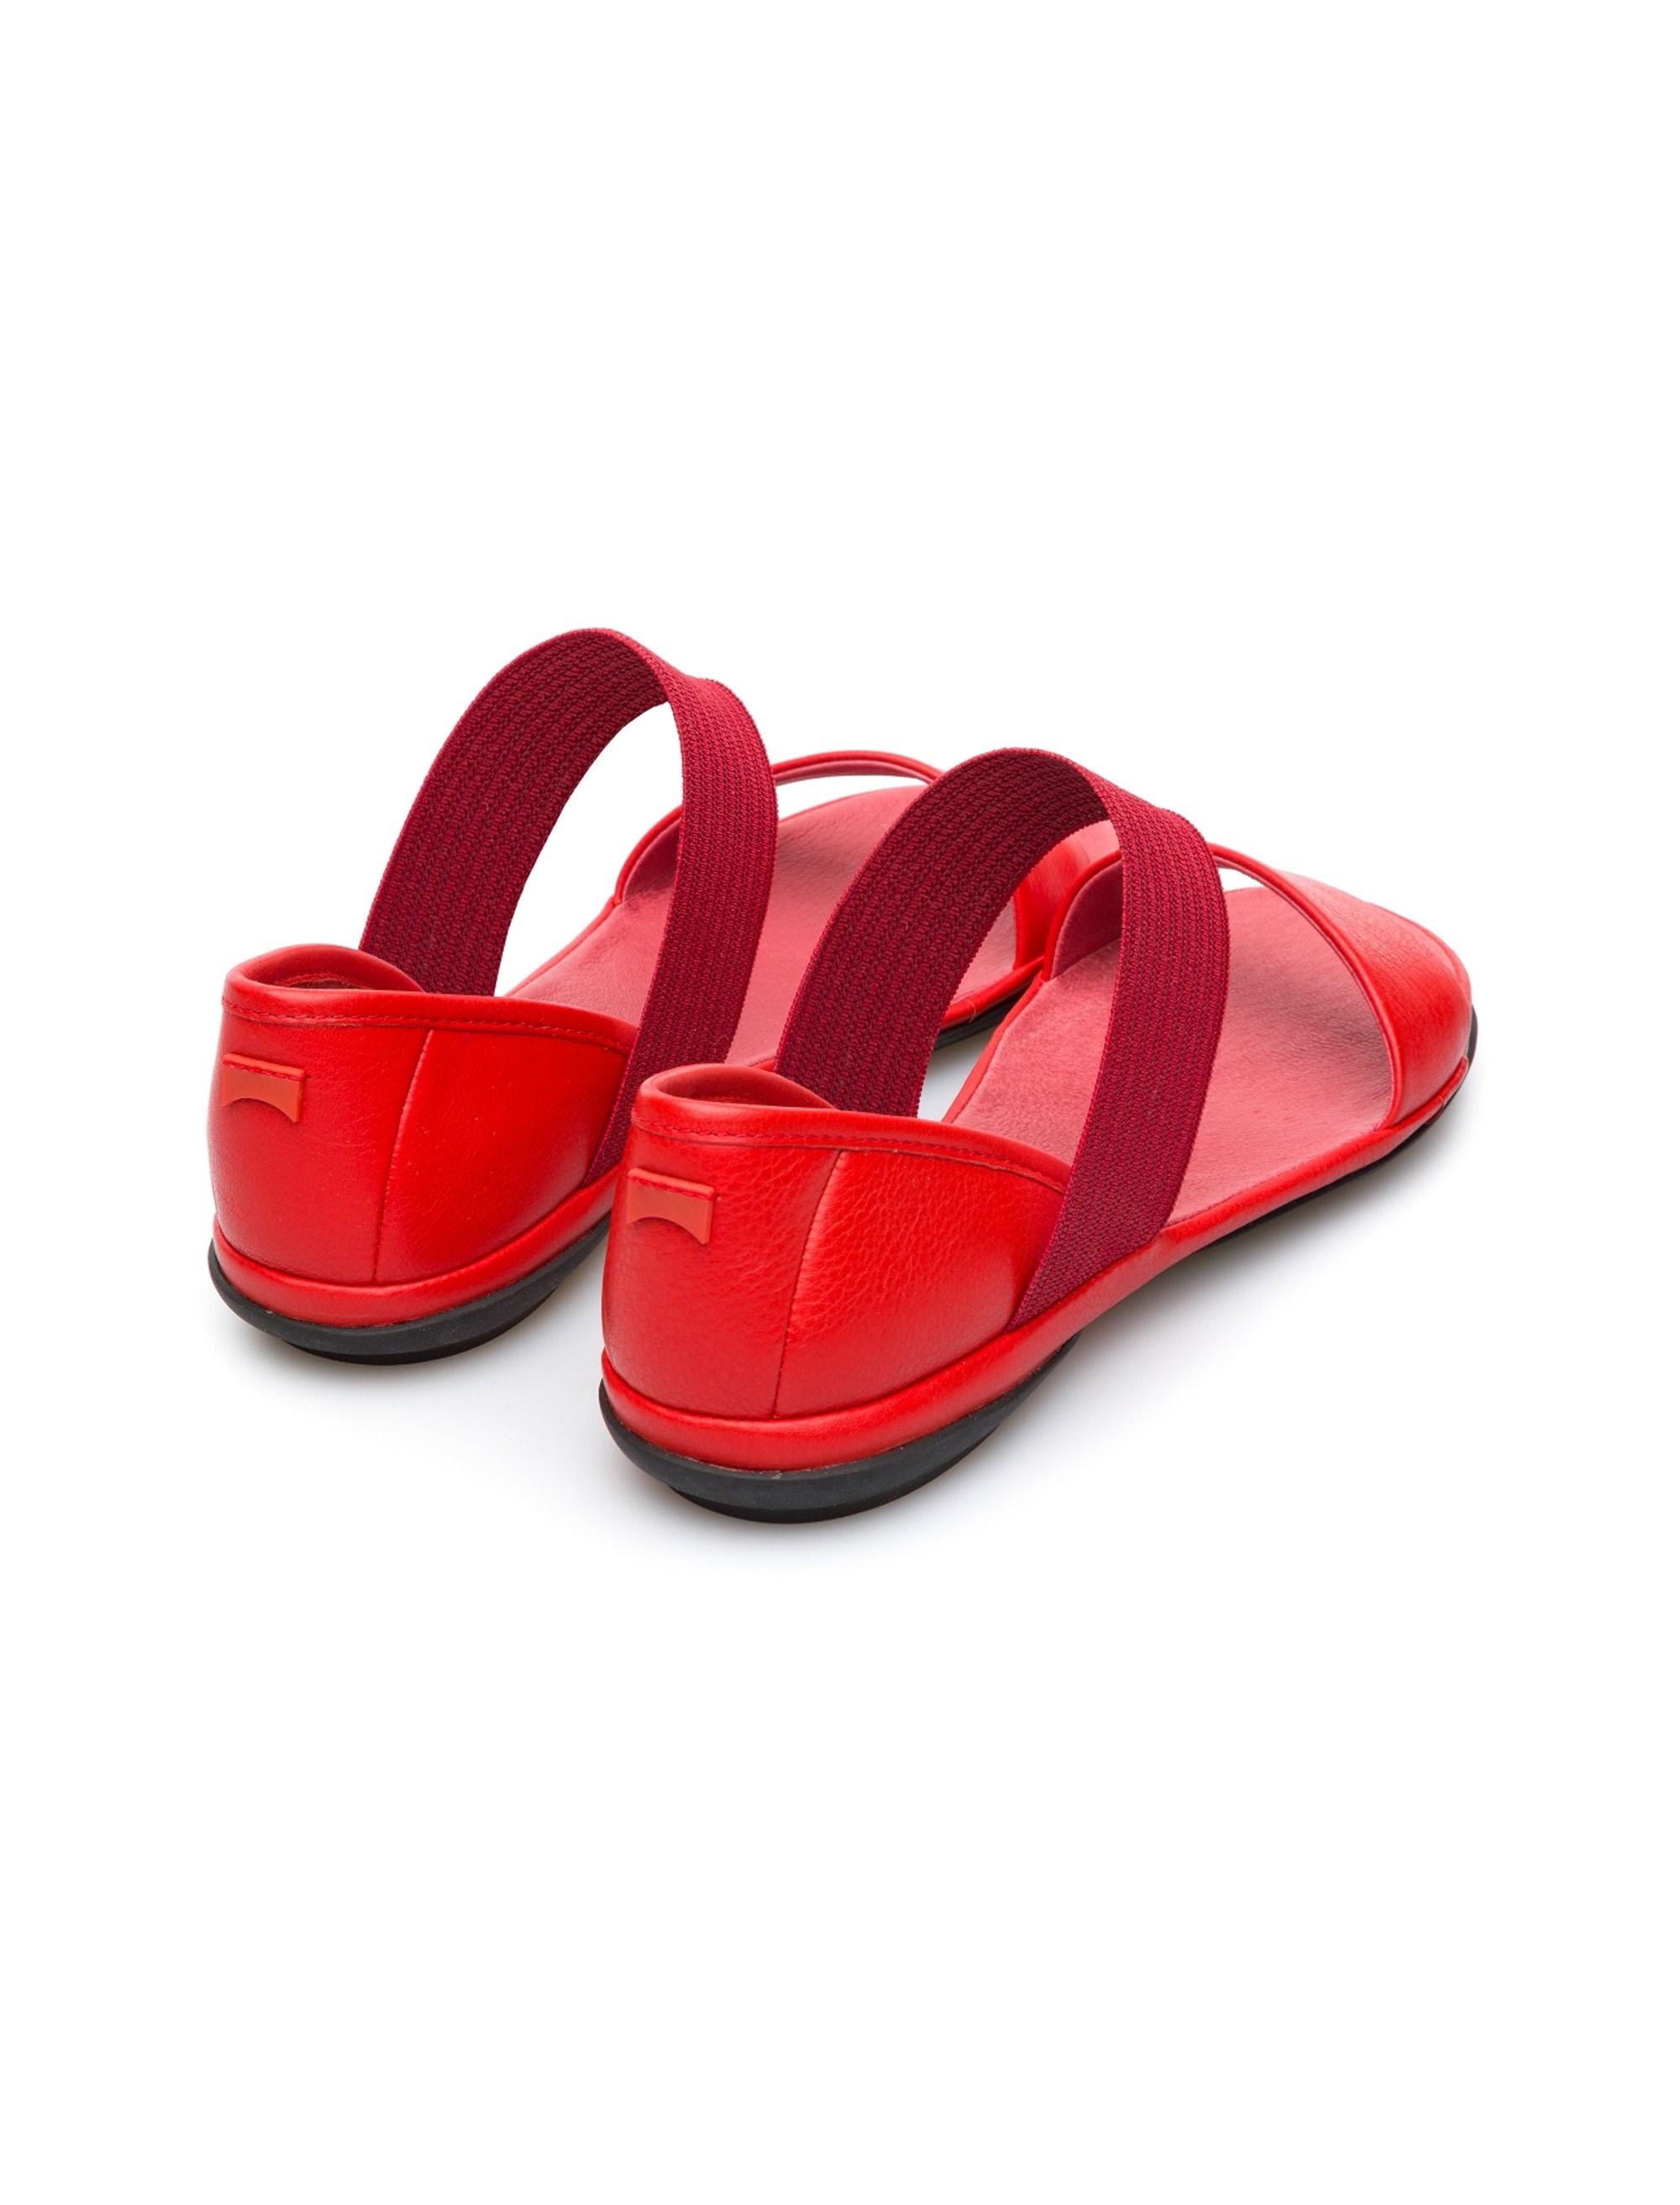 صندل تخت چرم زنانه Sella - کمپر - قرمز - 5